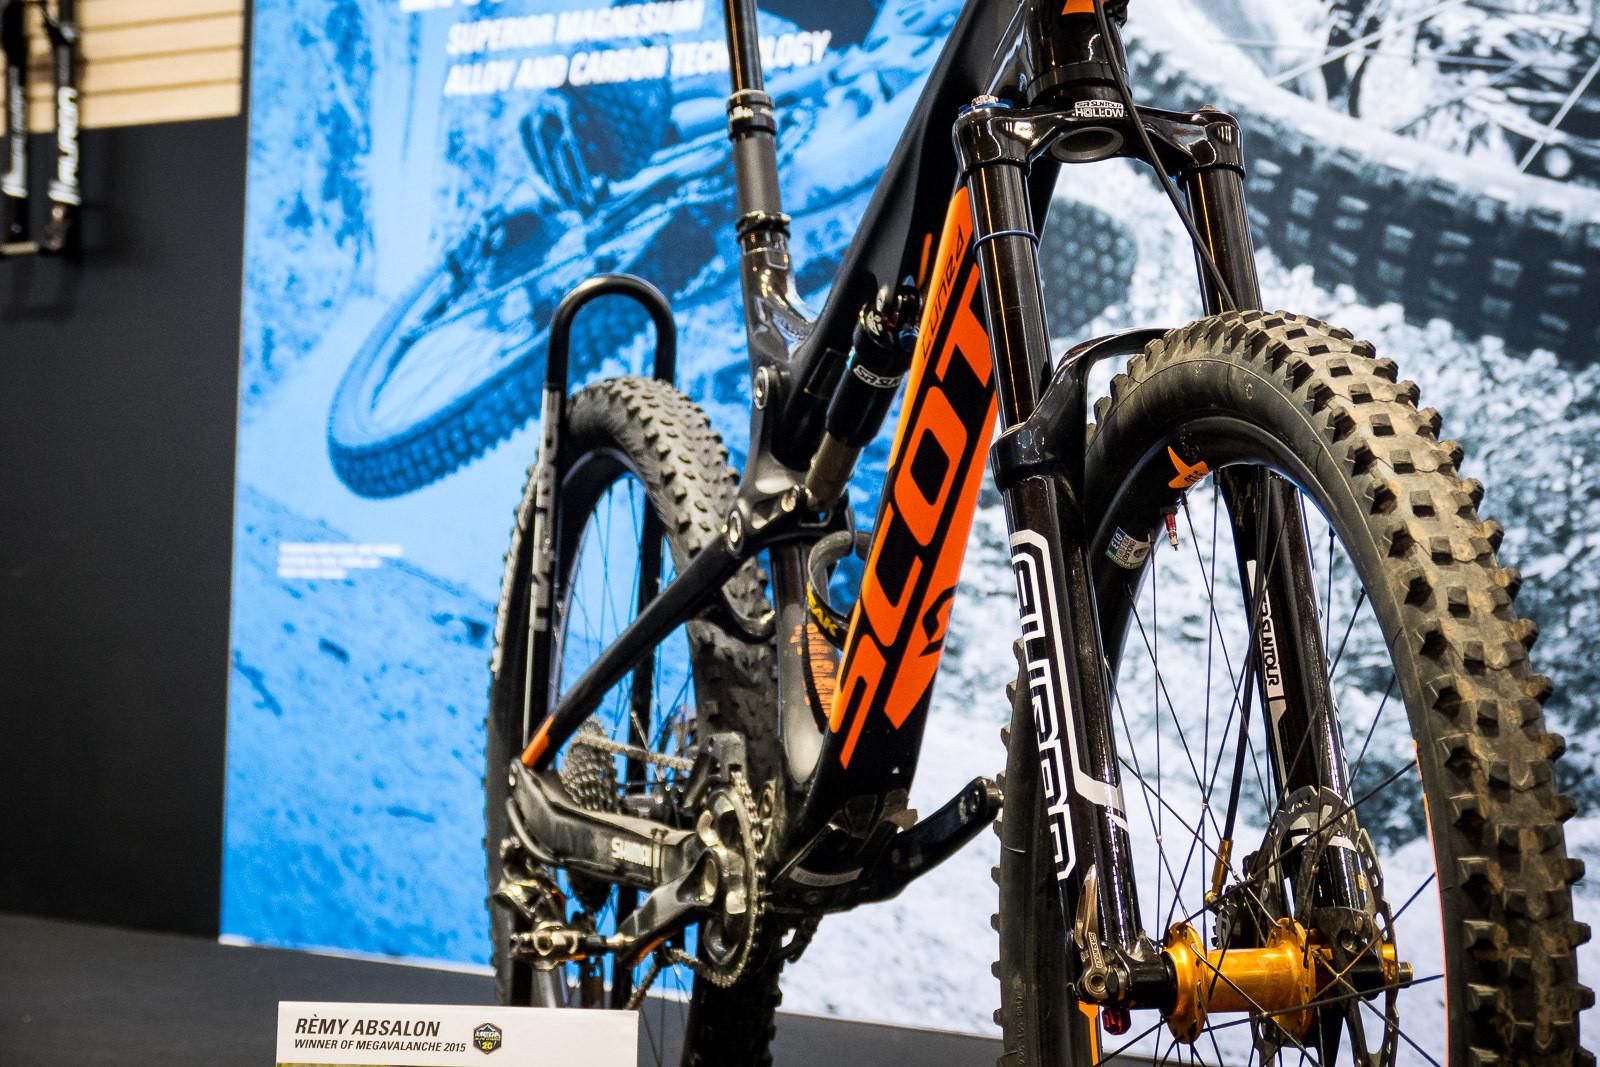 Updated 2016 SR Suntour Durolux - 2016 Mountain Bike Components at Eurobike - Mountain Biking Pictures - Vital MTB